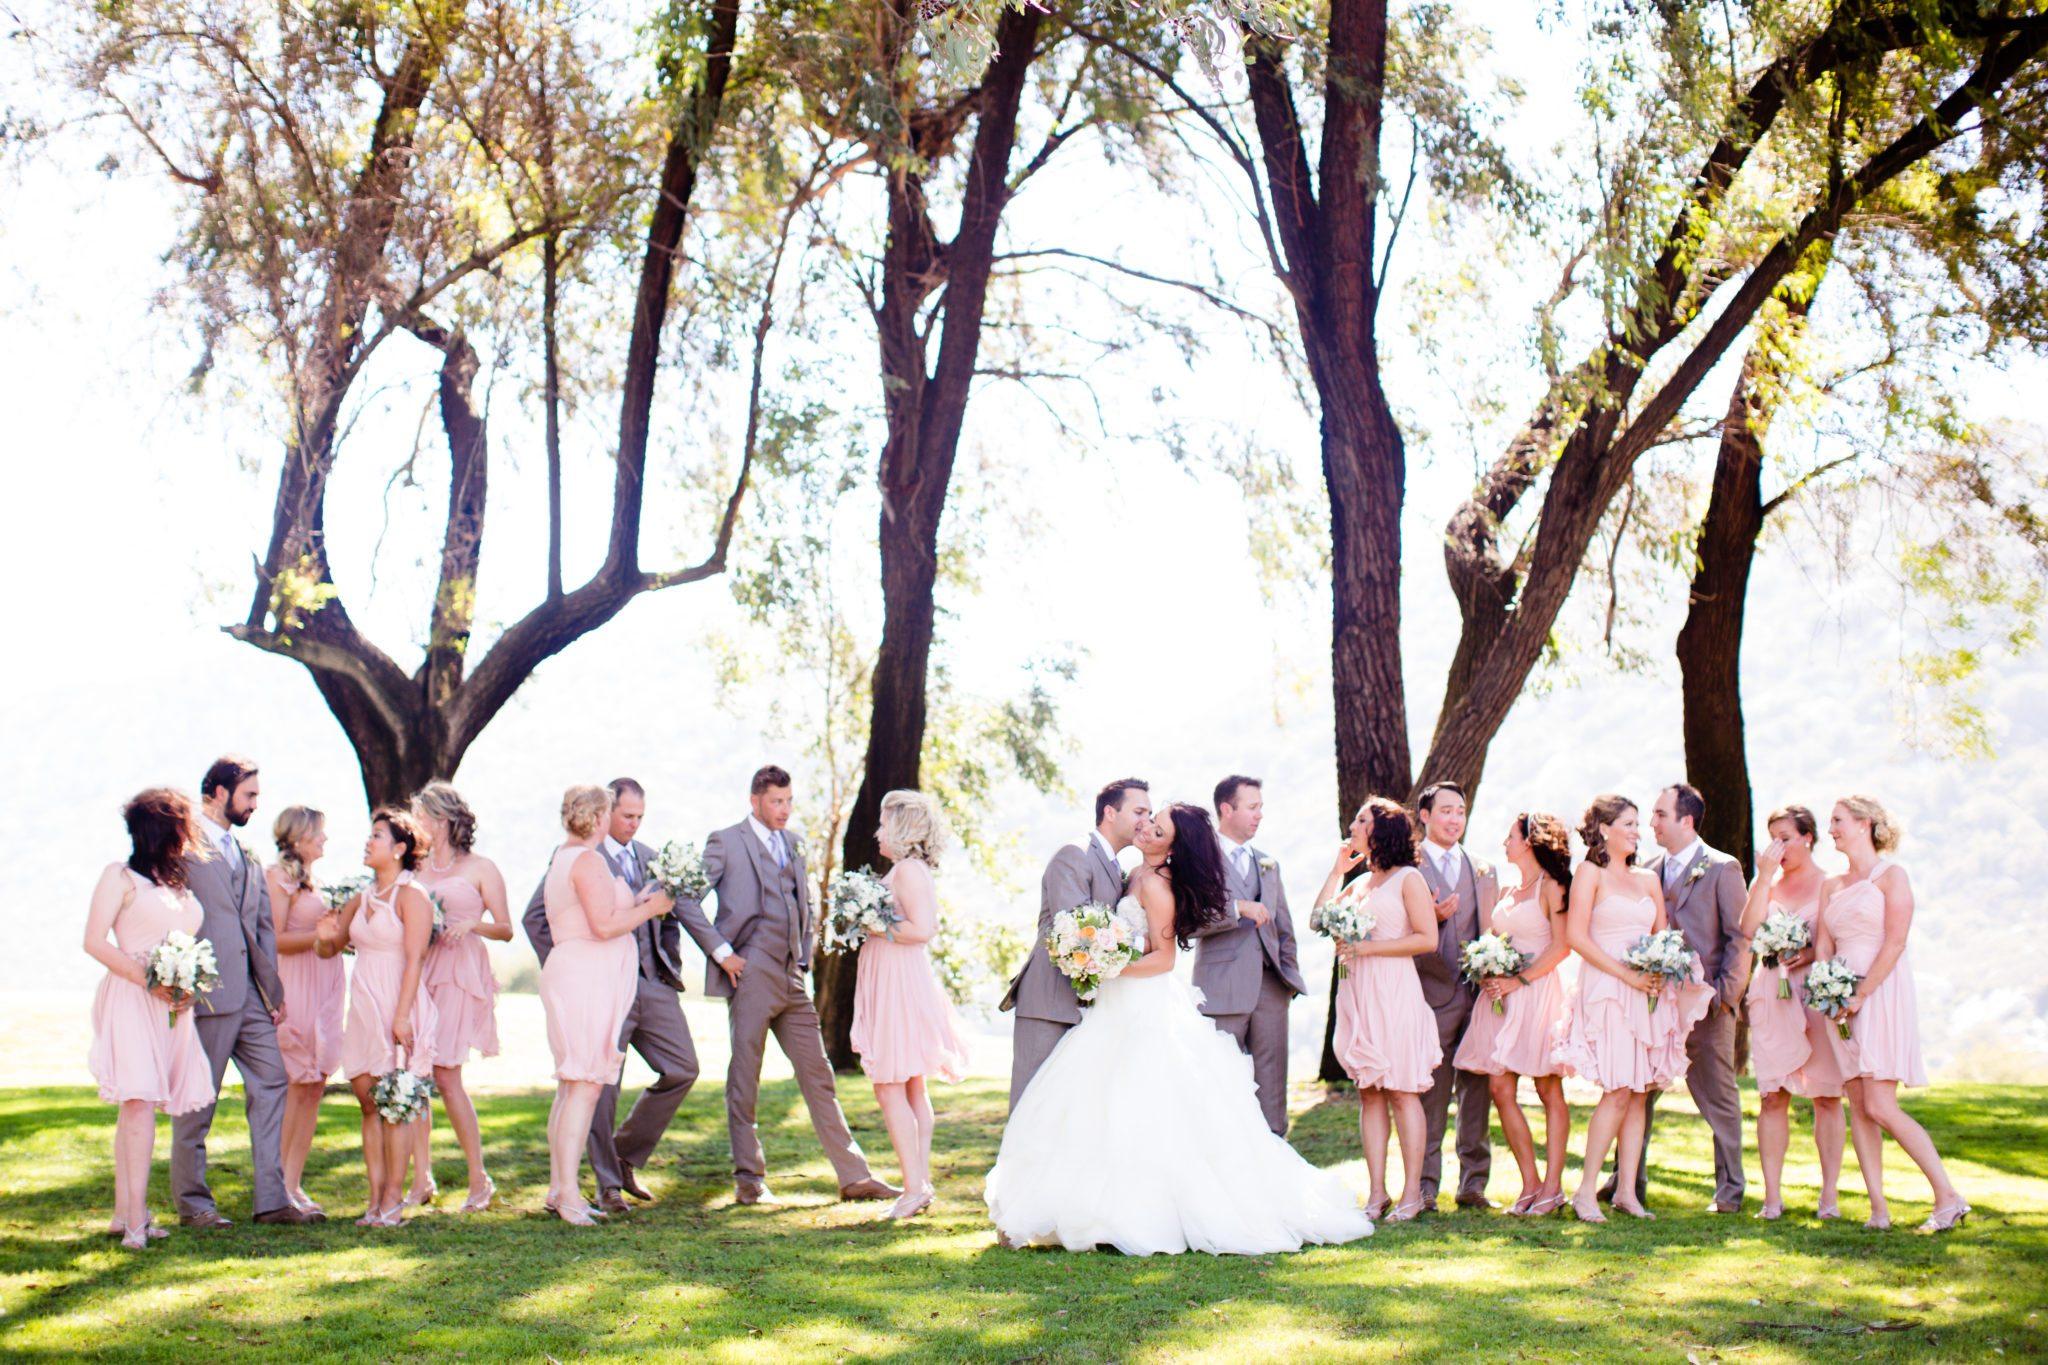 Temecula_Creek_Inn_Wedding_036.jpg